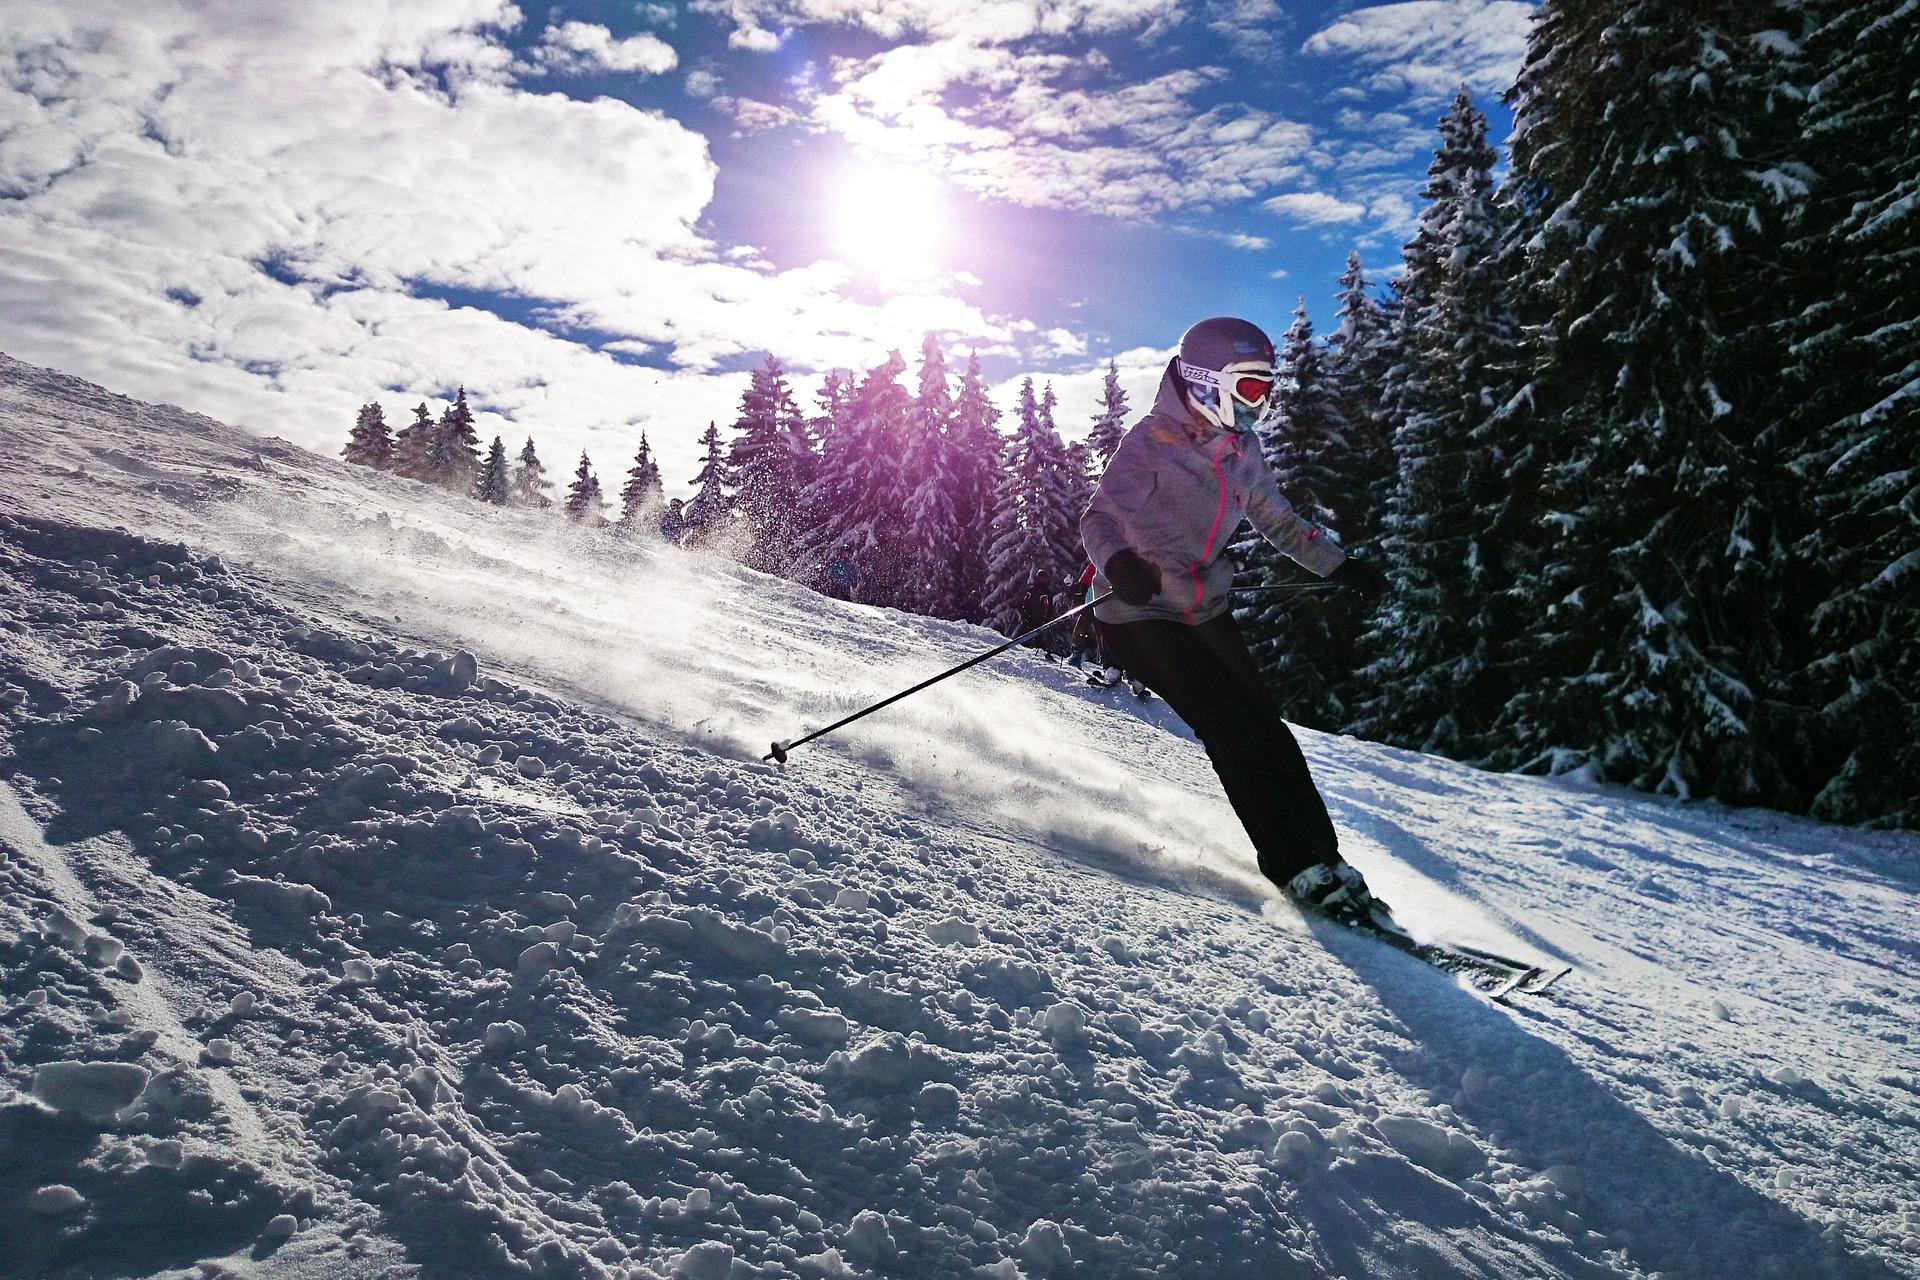 skiing snow pixabay skier